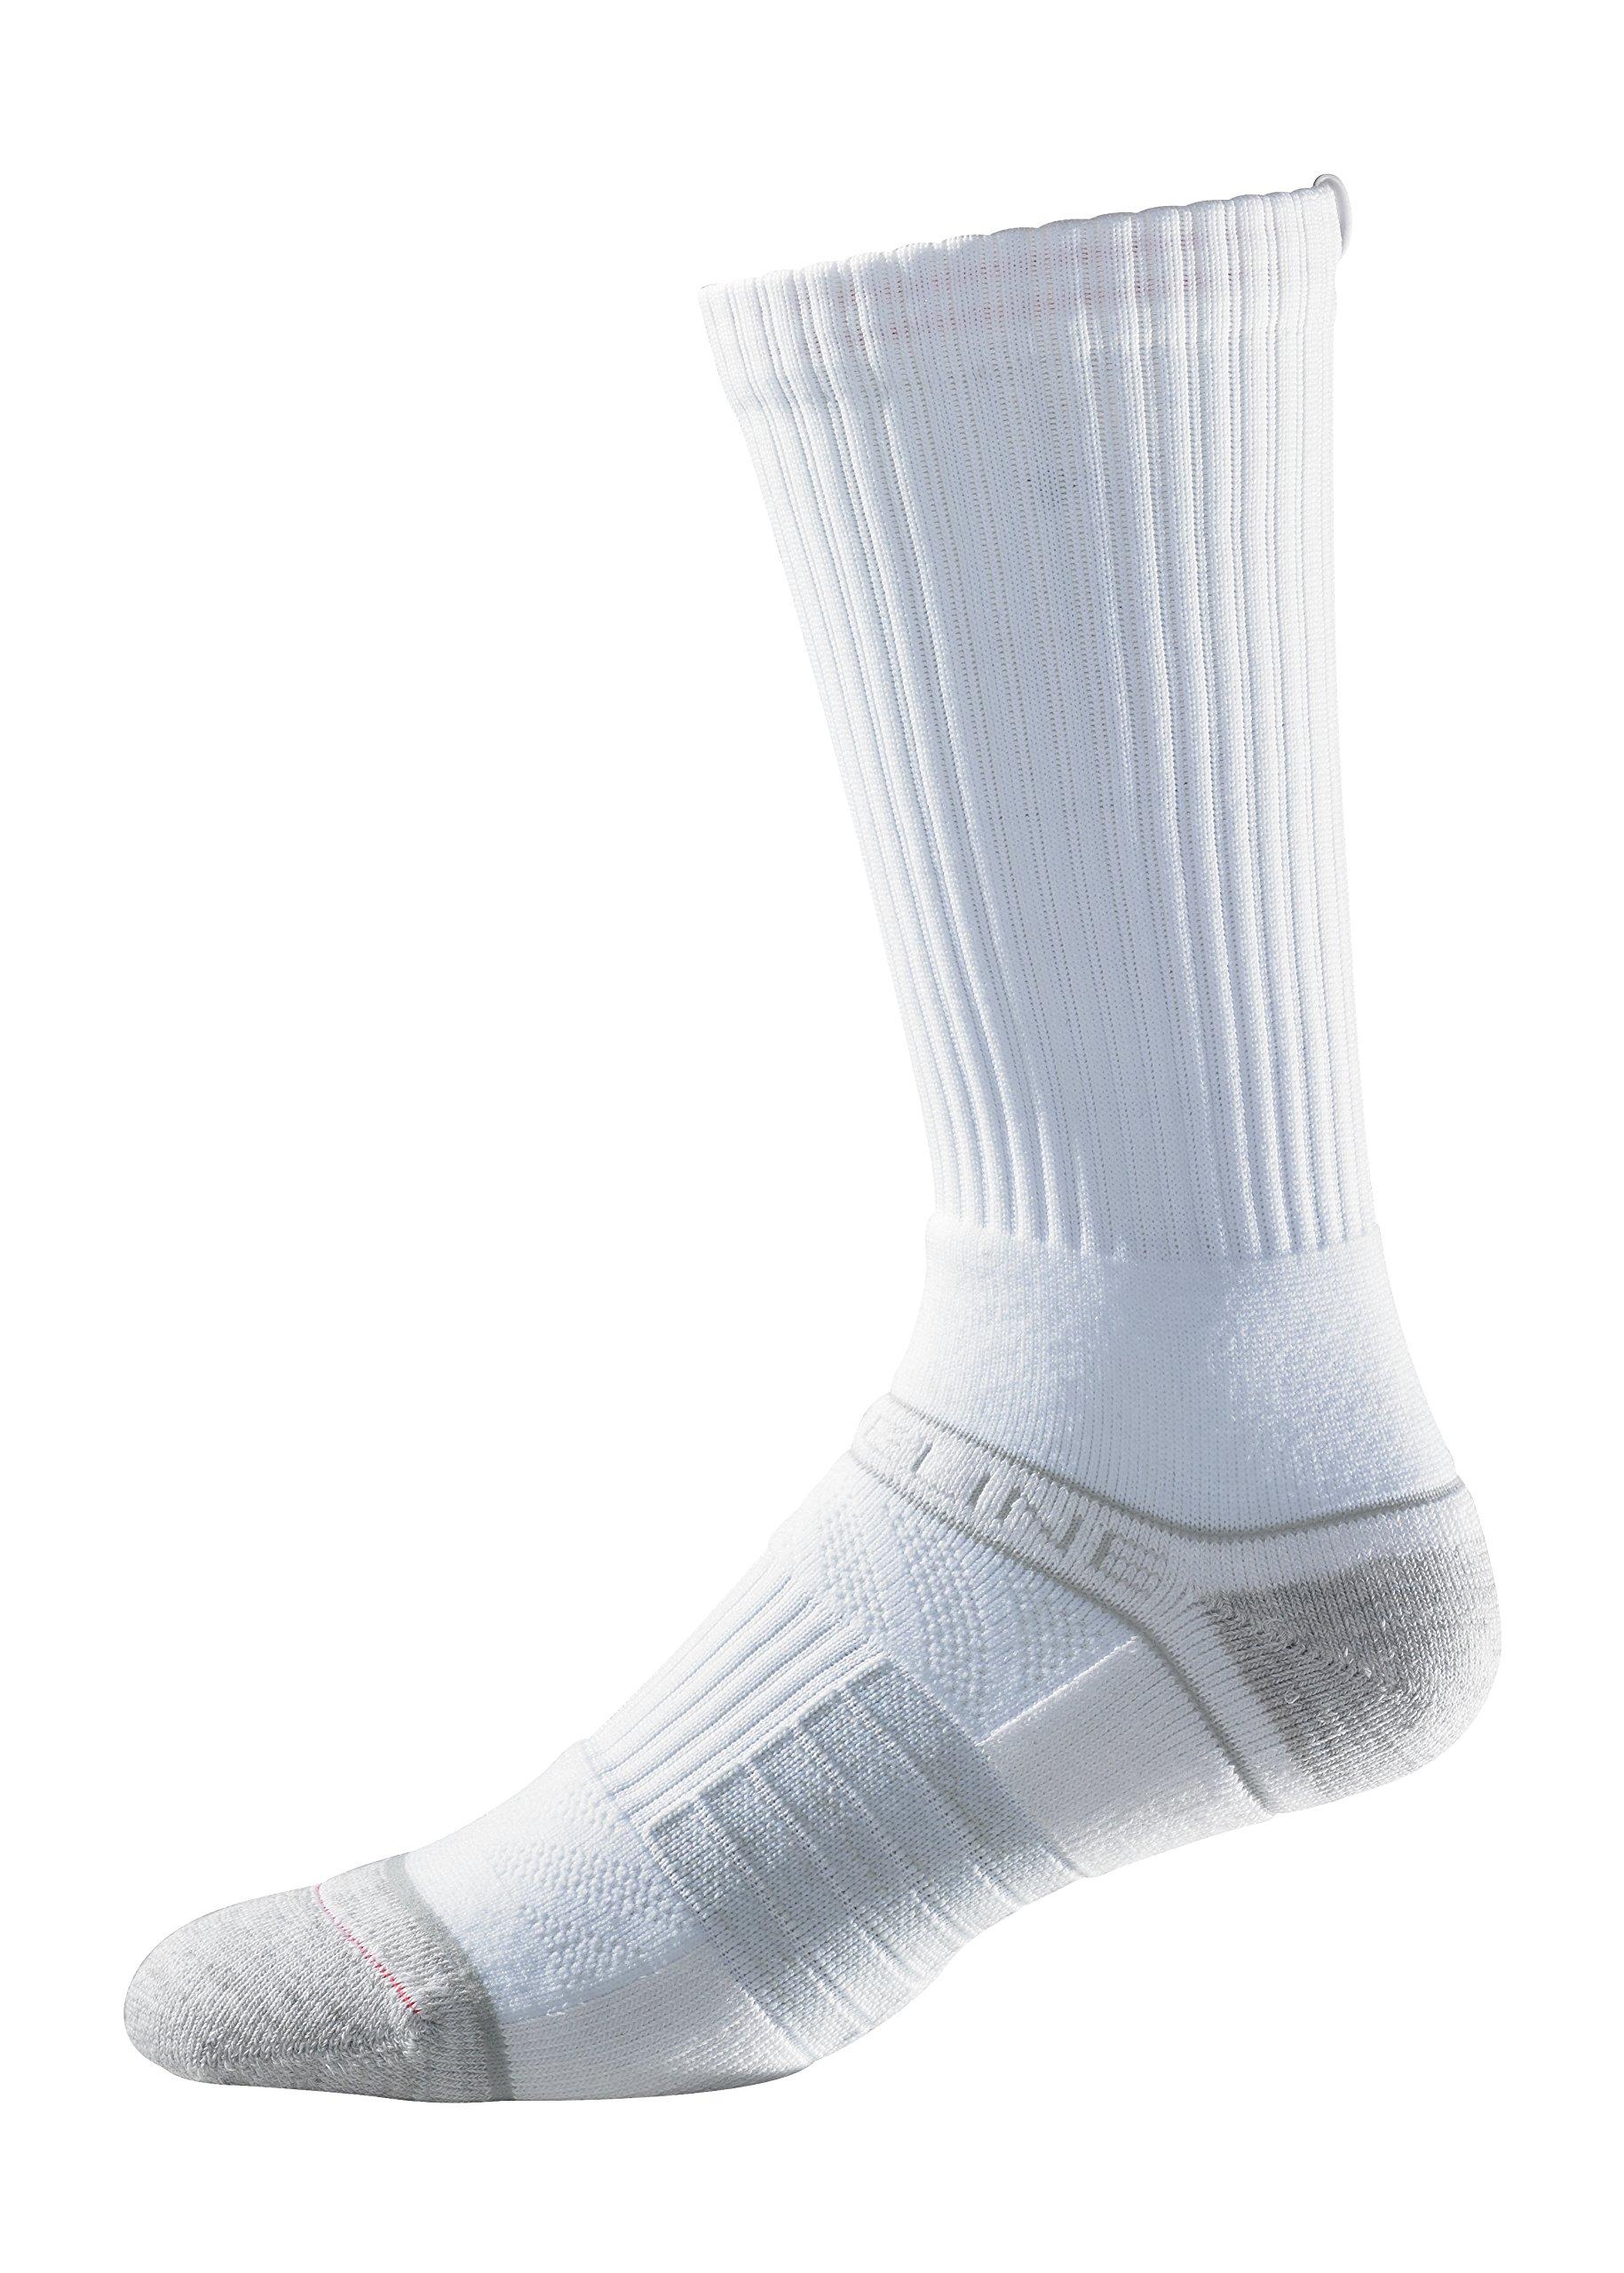 Strideline Youth Premium Athletic Crew Socks, One Size